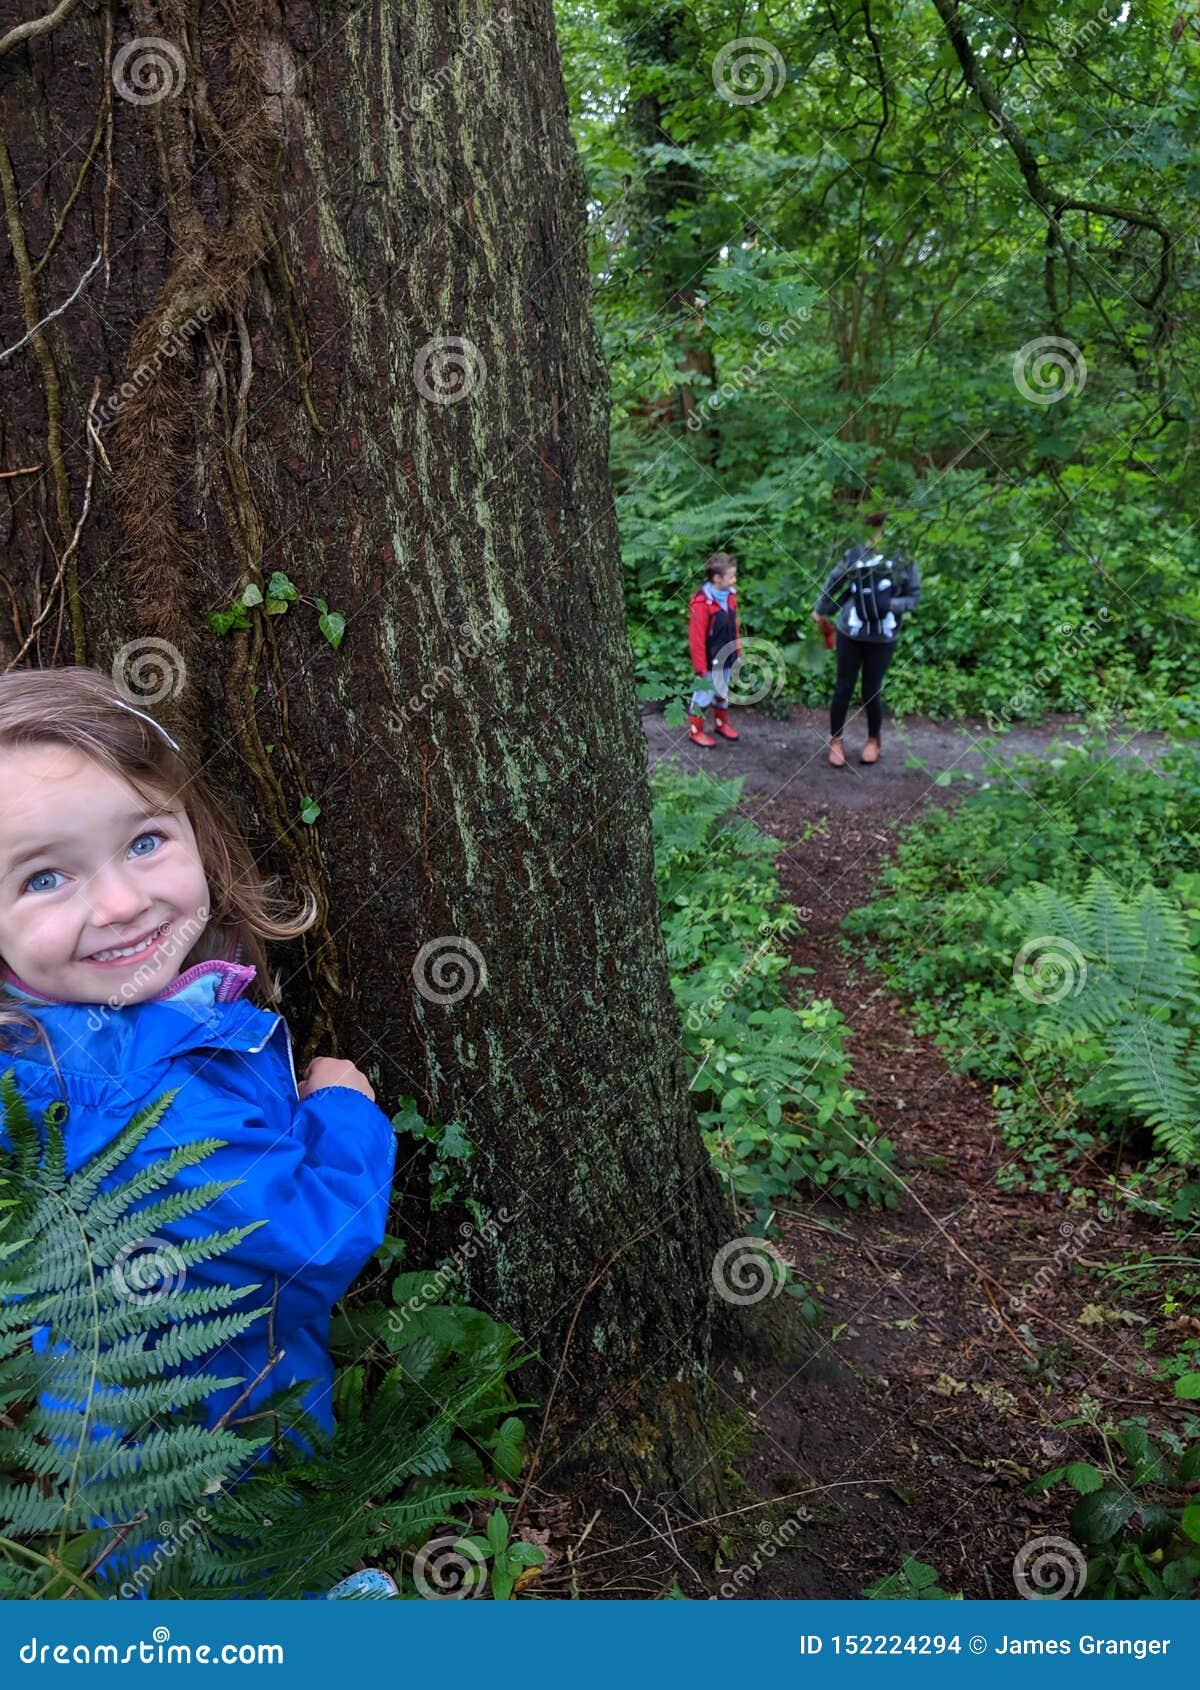 Poco muchacha sonriente juega escondite con su familia